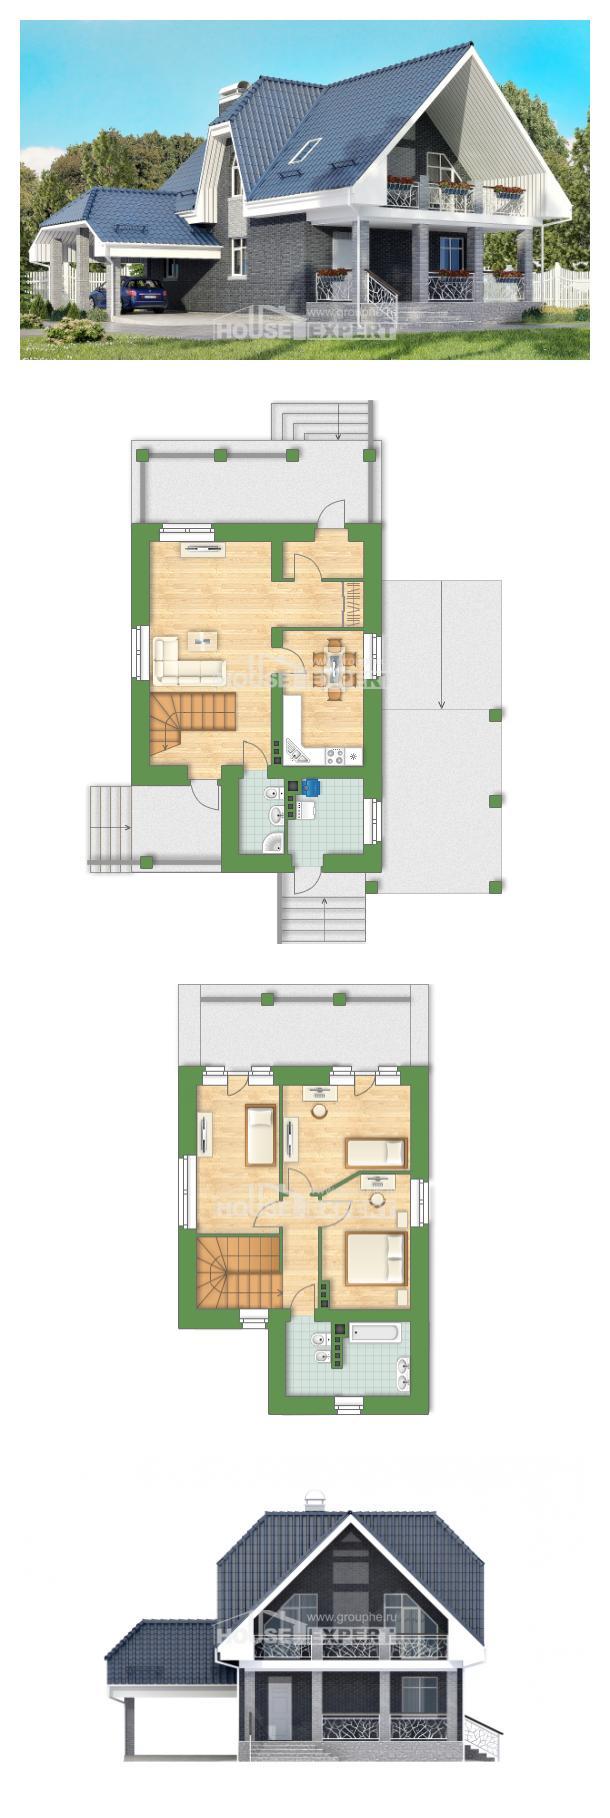 Projekt domu 125-002-L | House Expert